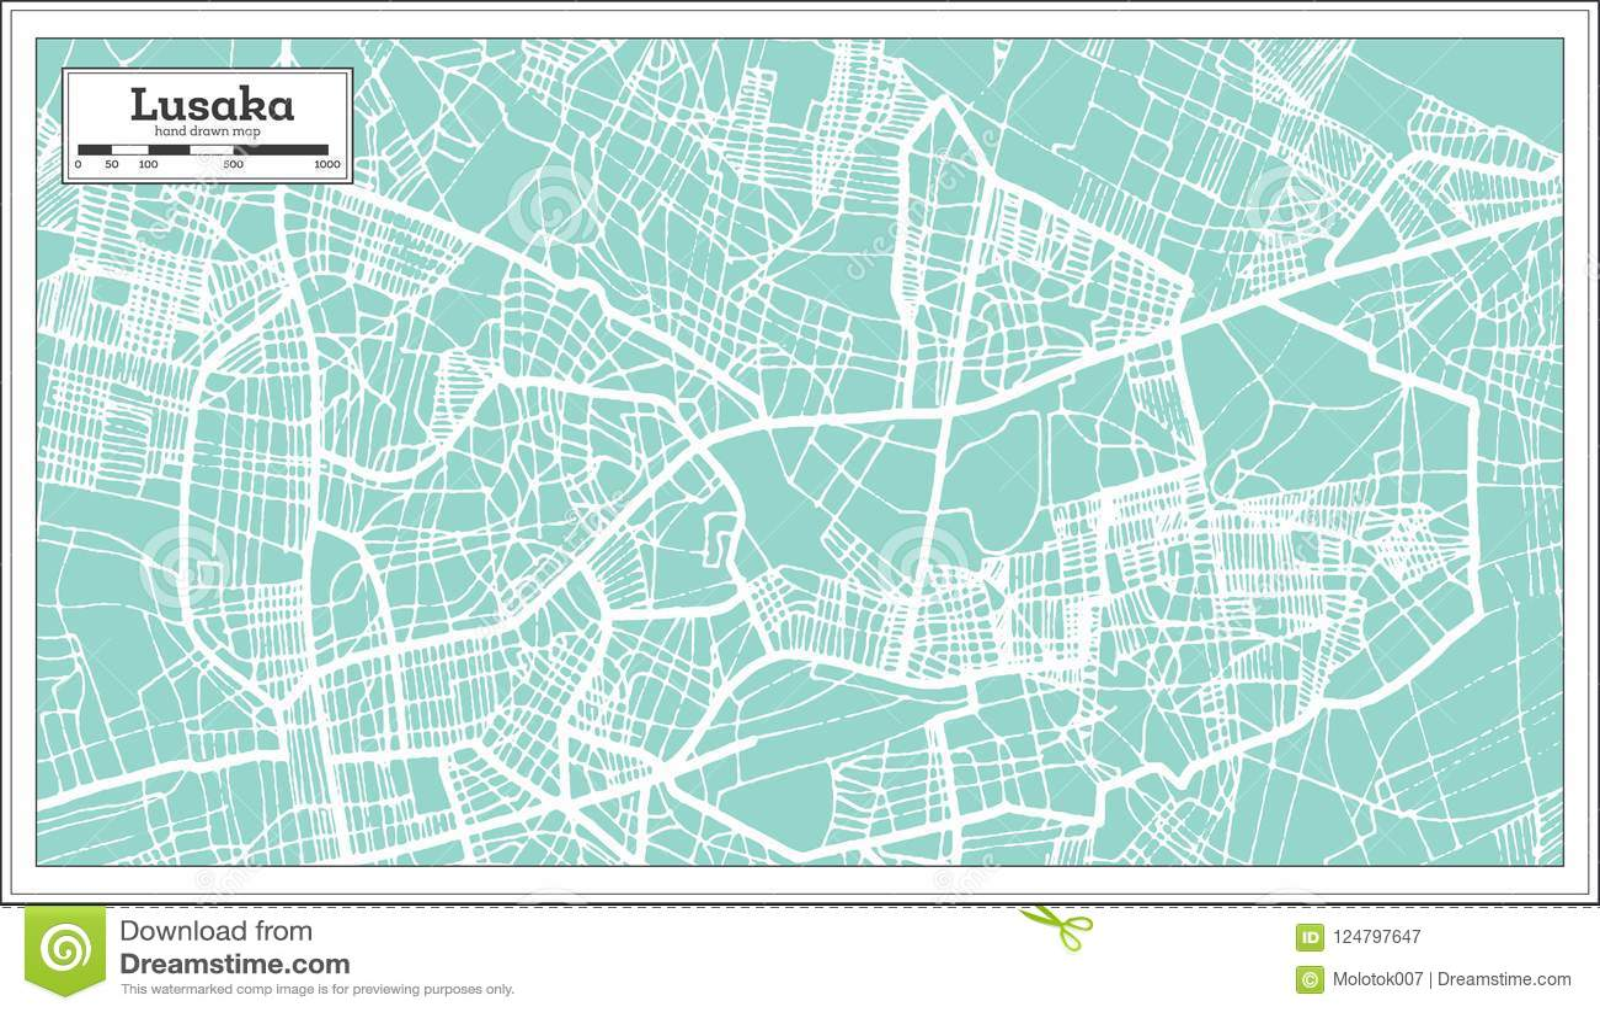 Lusaka Zambia Map.Lusaka Zambia City Map In Retro Style Outline Map Stock